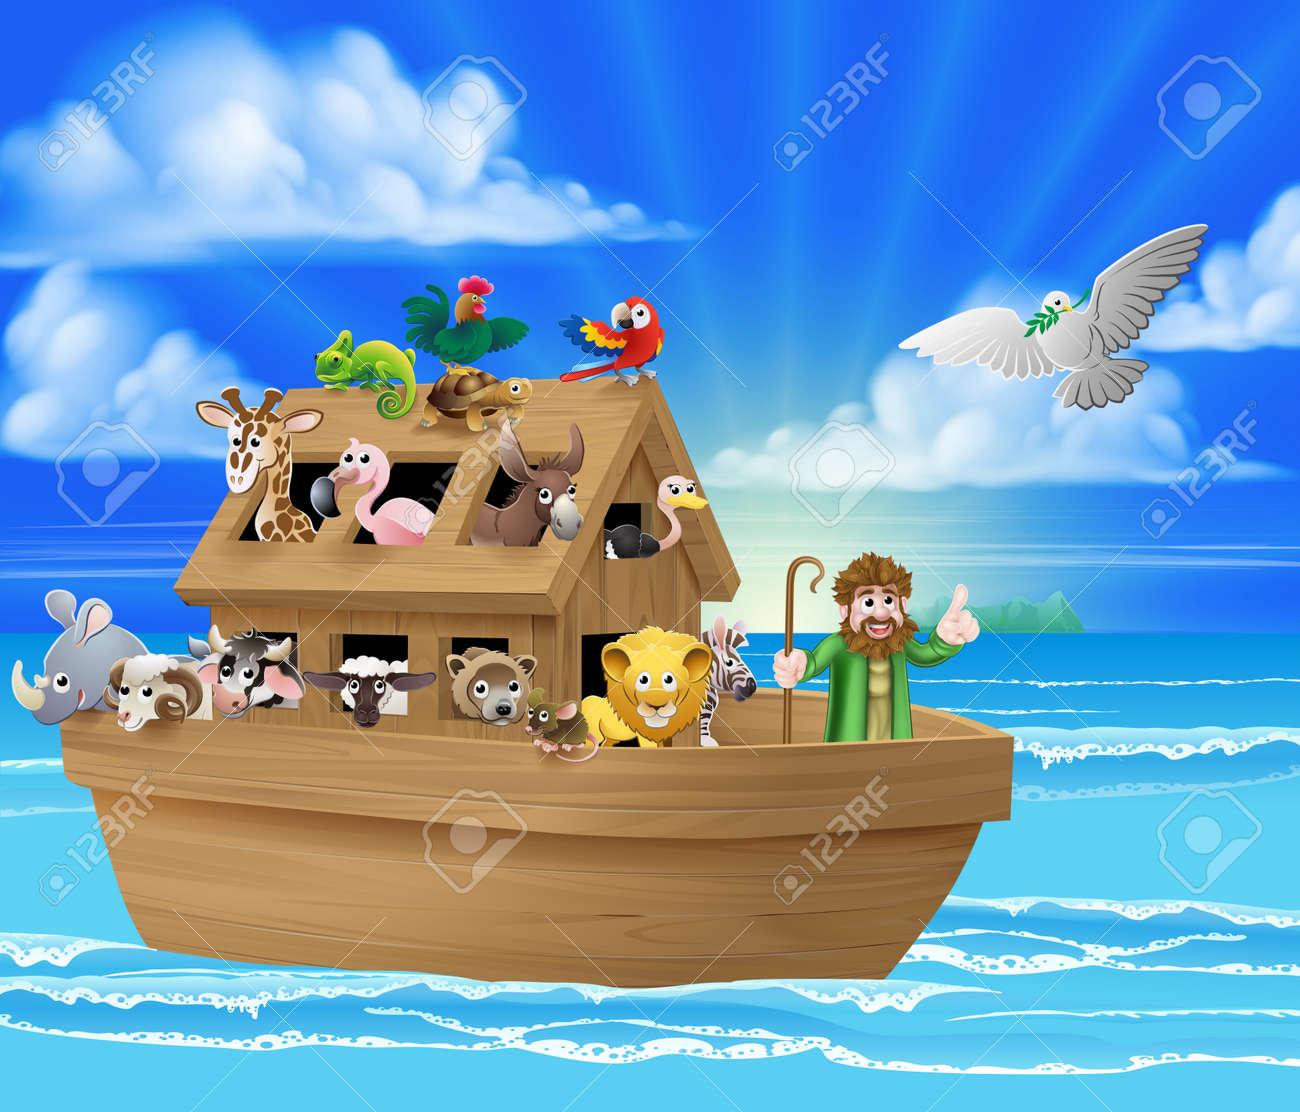 Noah Ark Stock Photos. Royalty Free Noah Ark Images